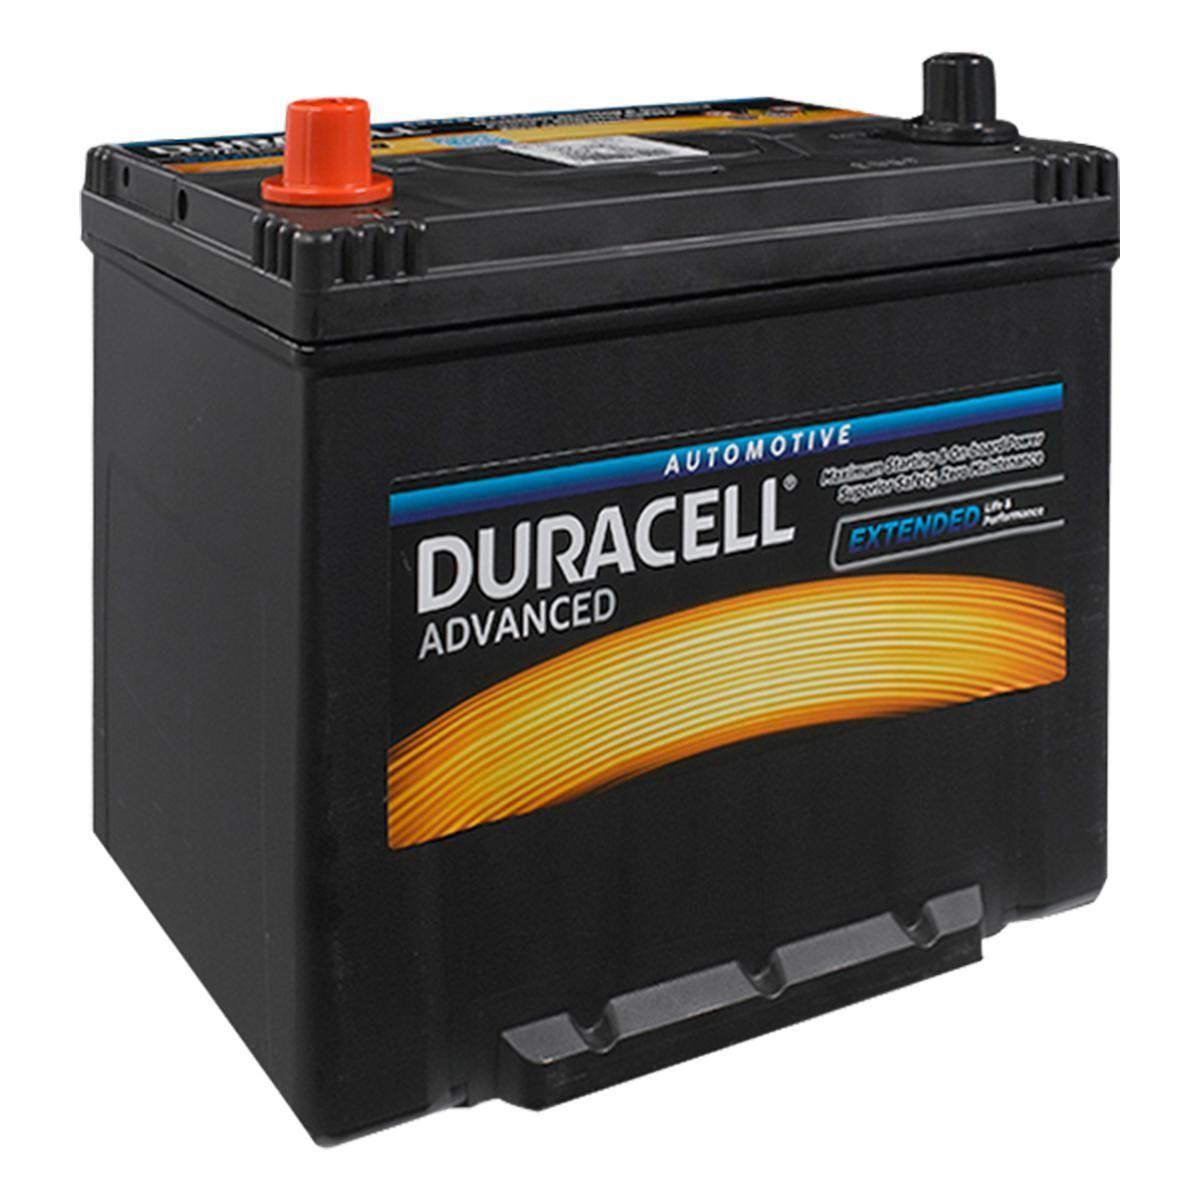 Duracell Car Battery Review >> Da70l Duracell Advanced Car Battery 12v 70ah 069 Da 70l